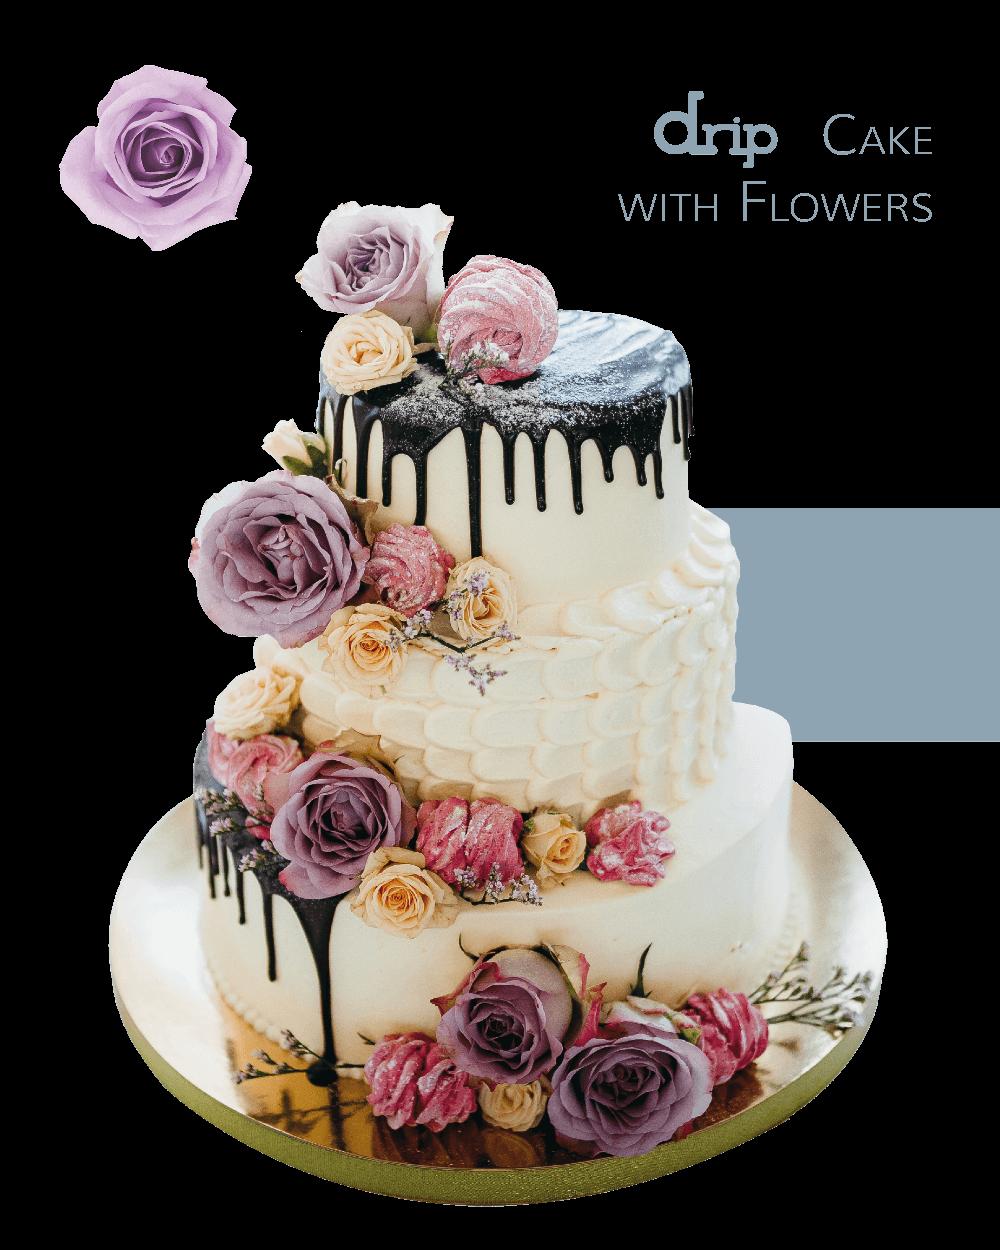 CAKE-DESIGN-DRIP-CAKE-WITH-FLOWERS-responsive